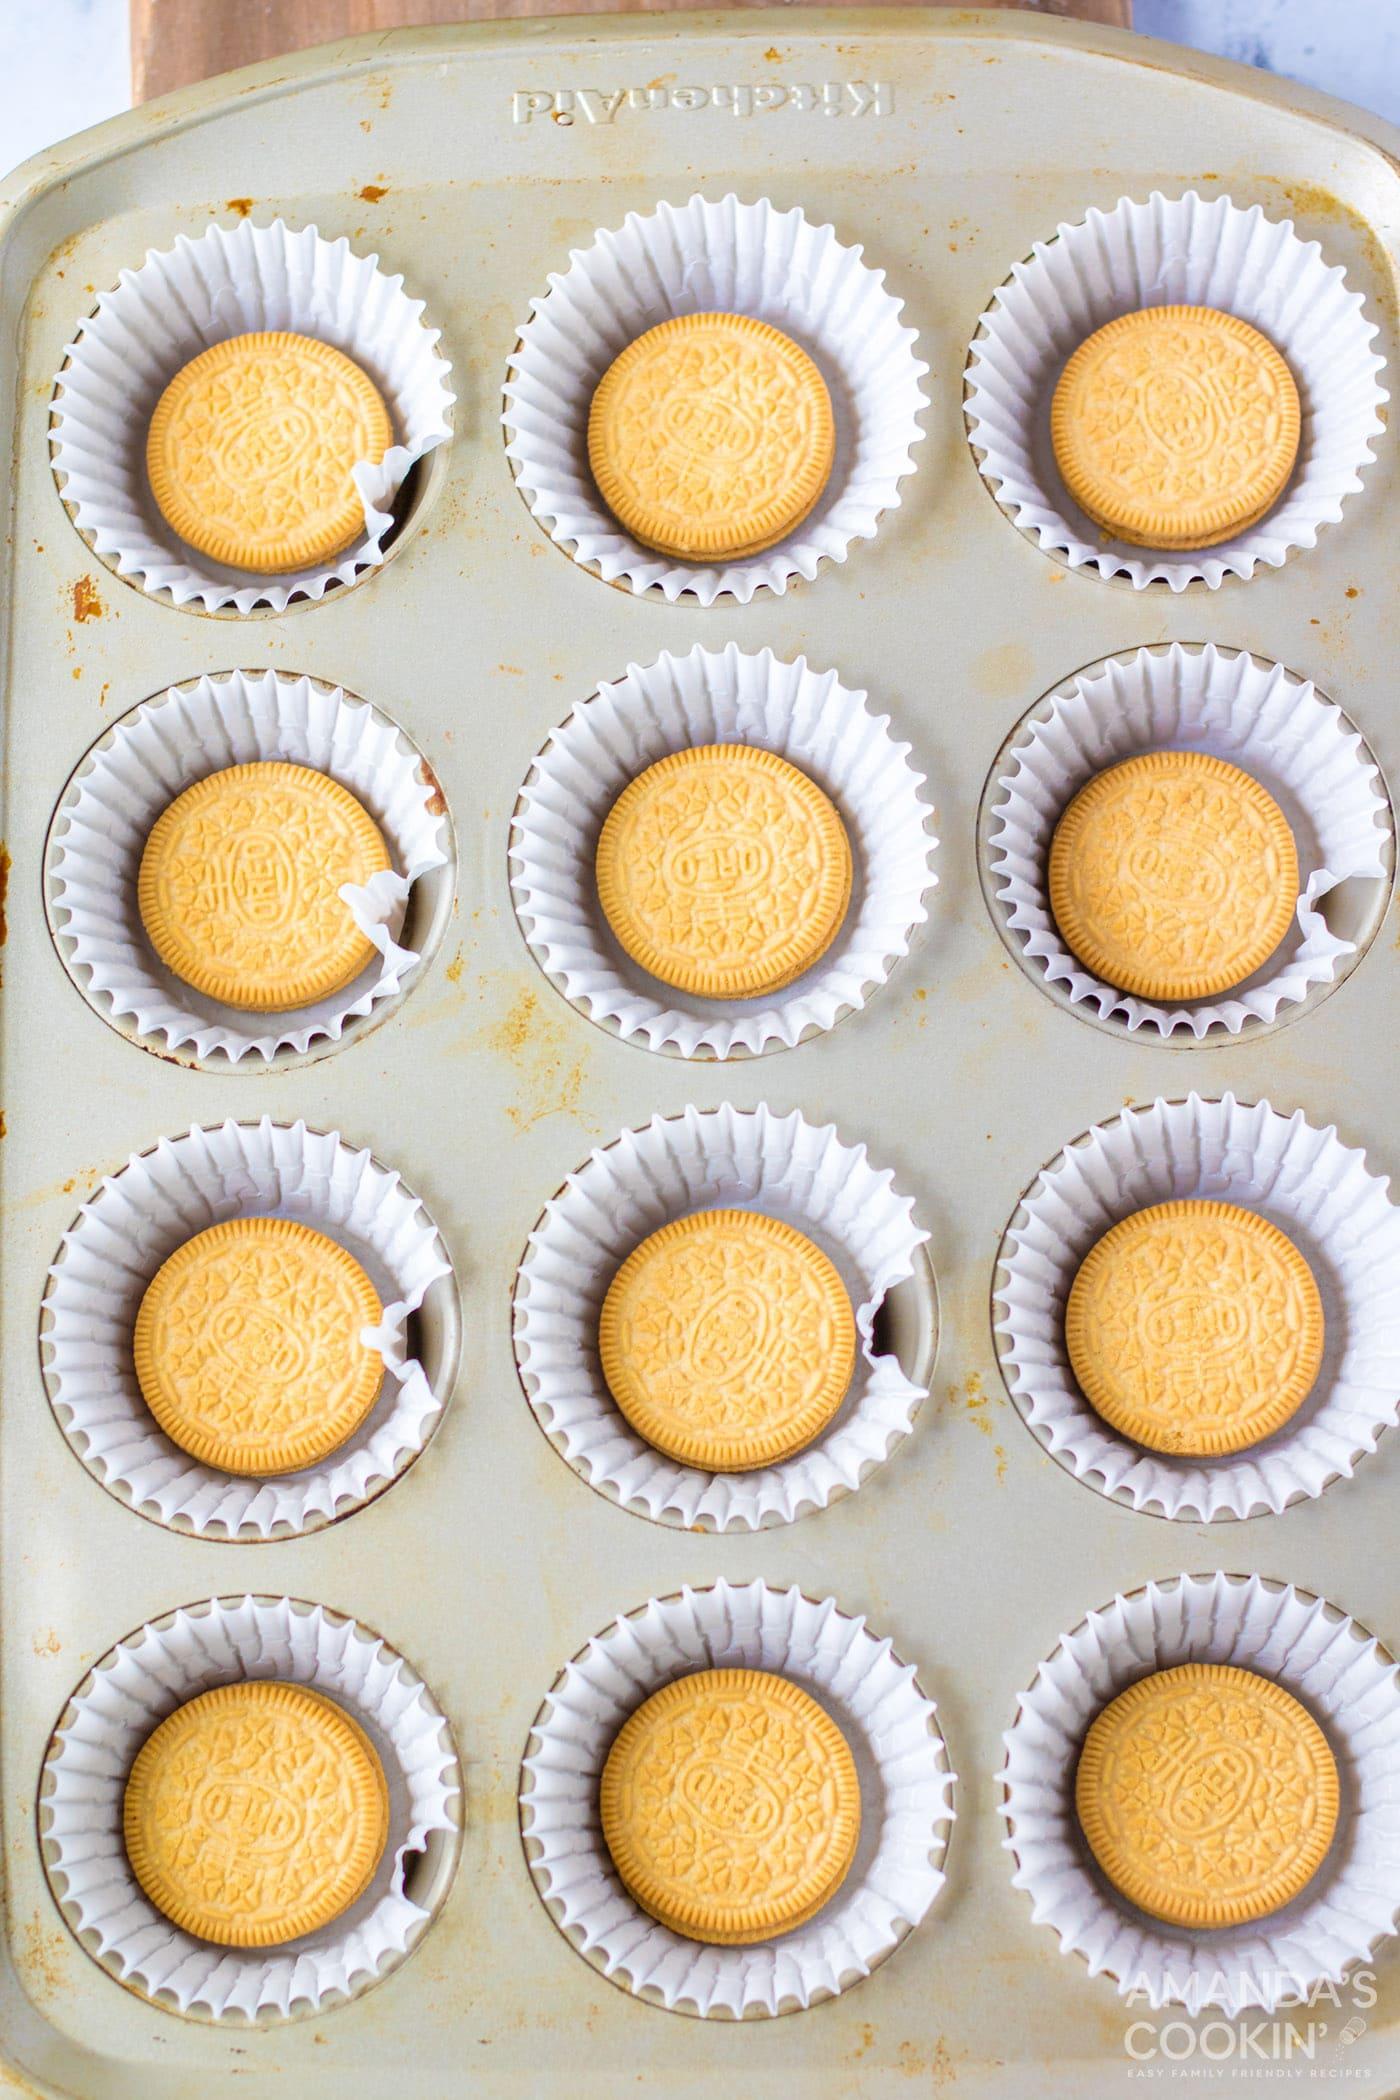 golden Oreos in a mini muffin tin